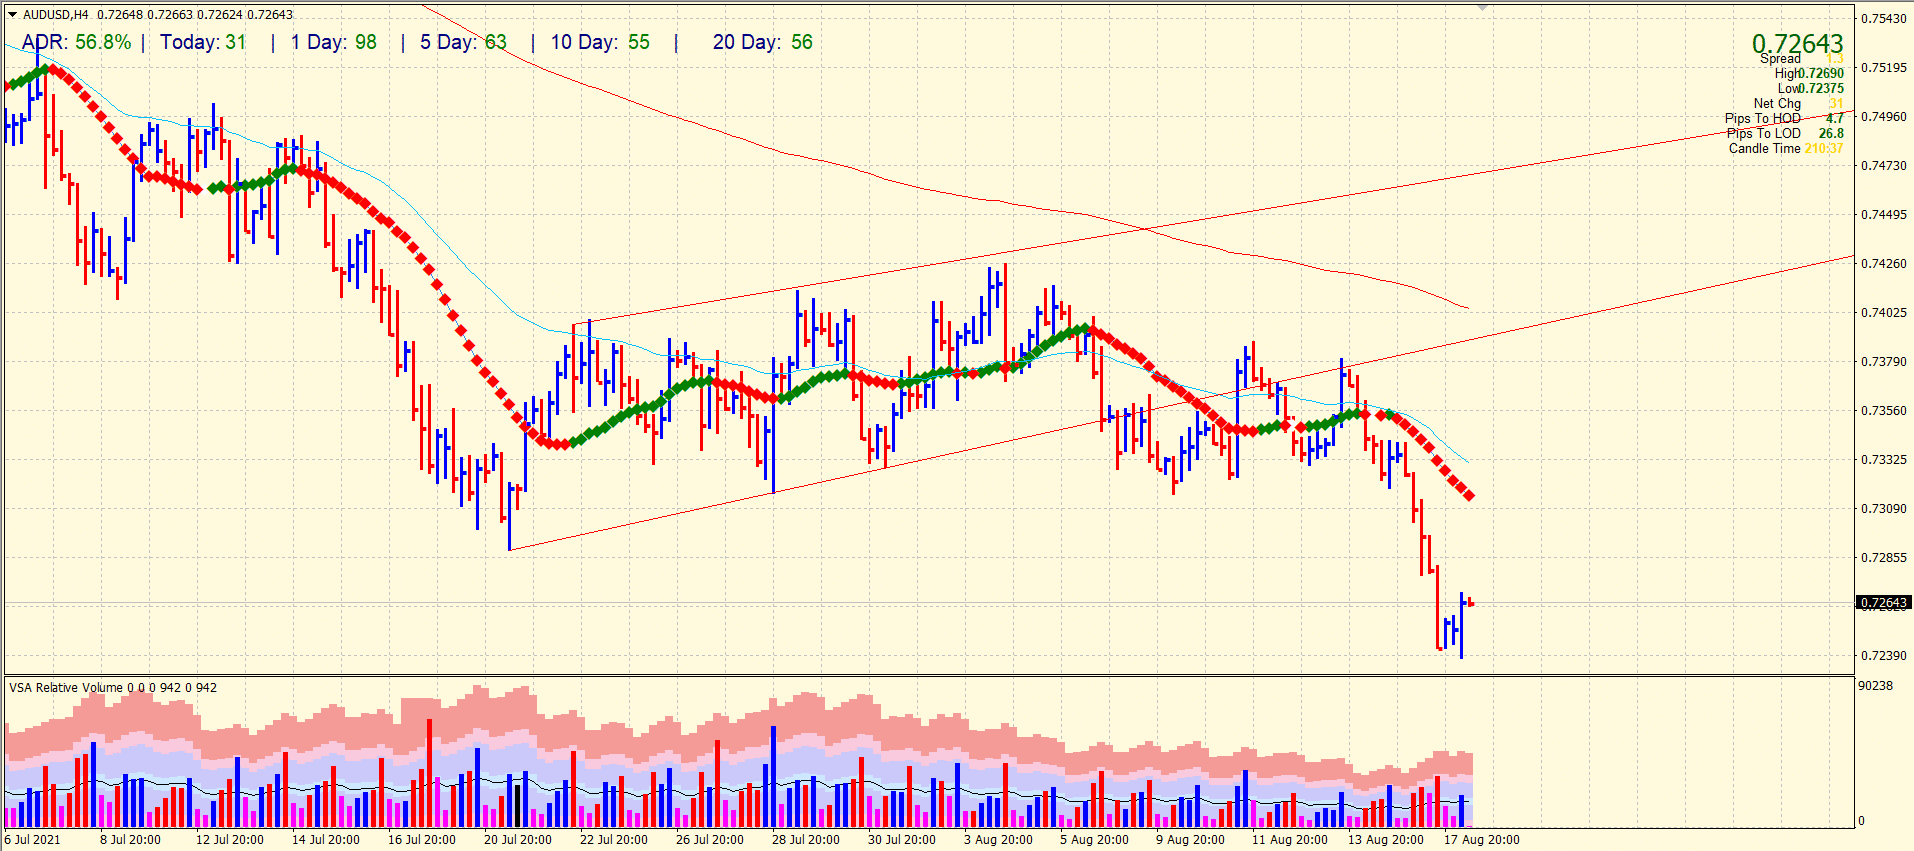 AUD/USD 4-hour chart forecast